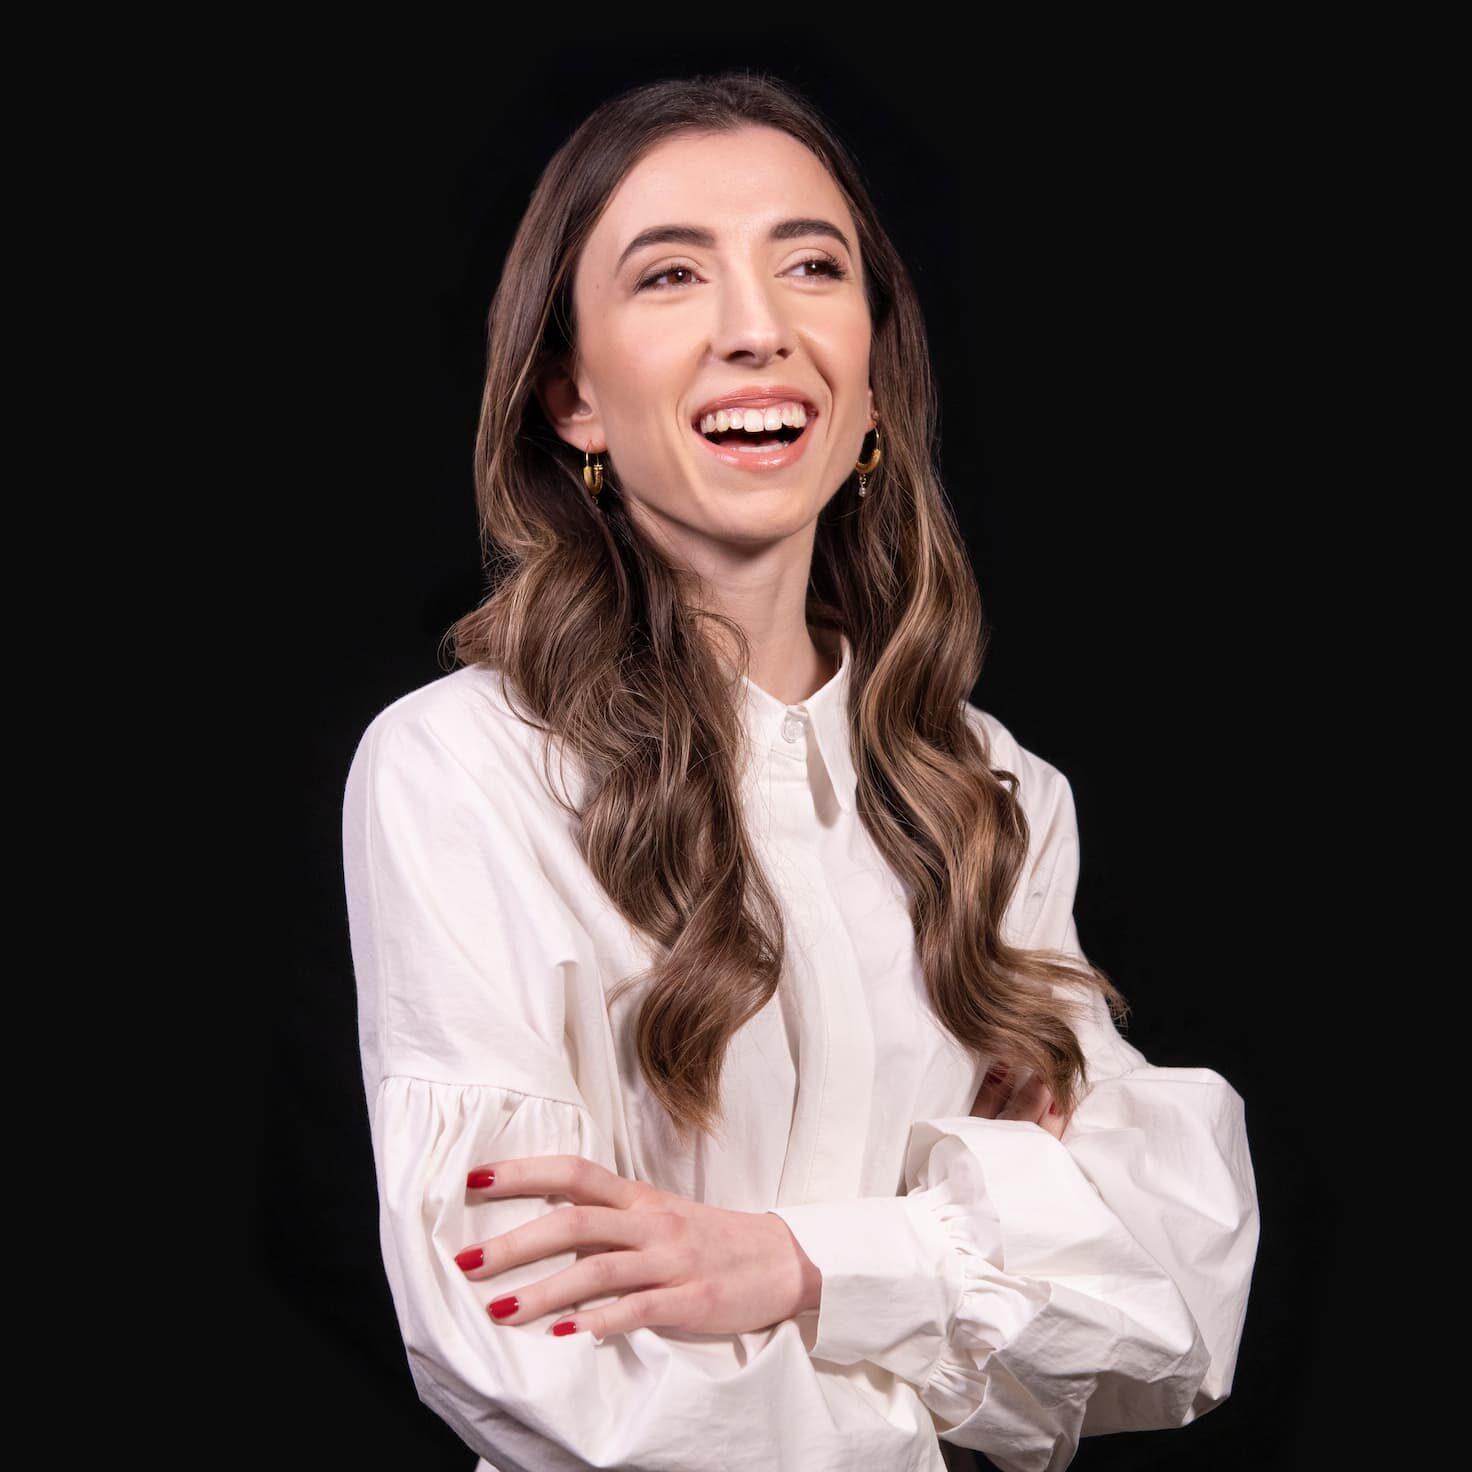 Marta Jerković